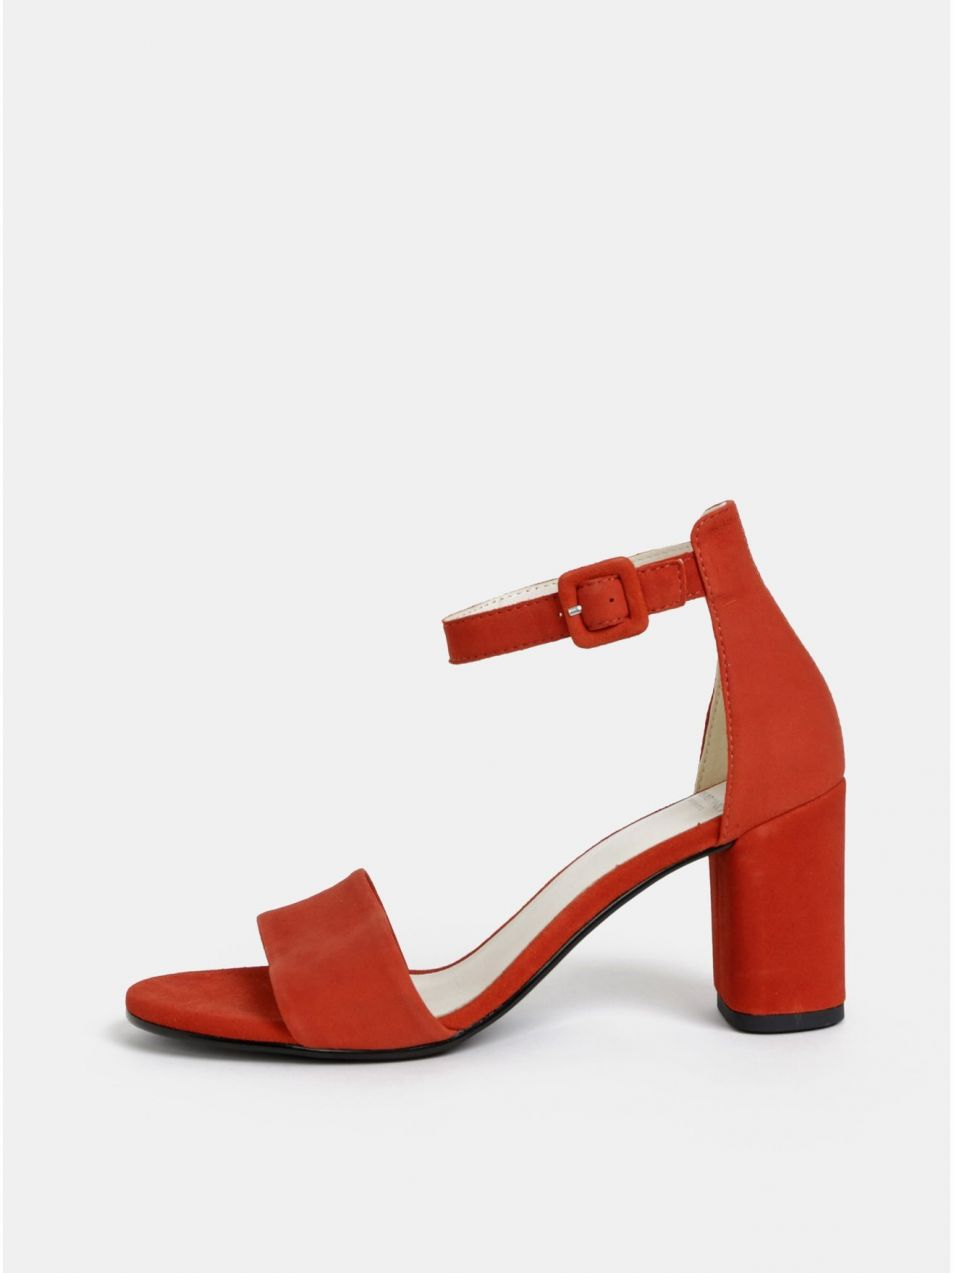 406ecd15e4 Červené semišové sandálky Vagabond Penny značky Vagabond - Lovely.sk